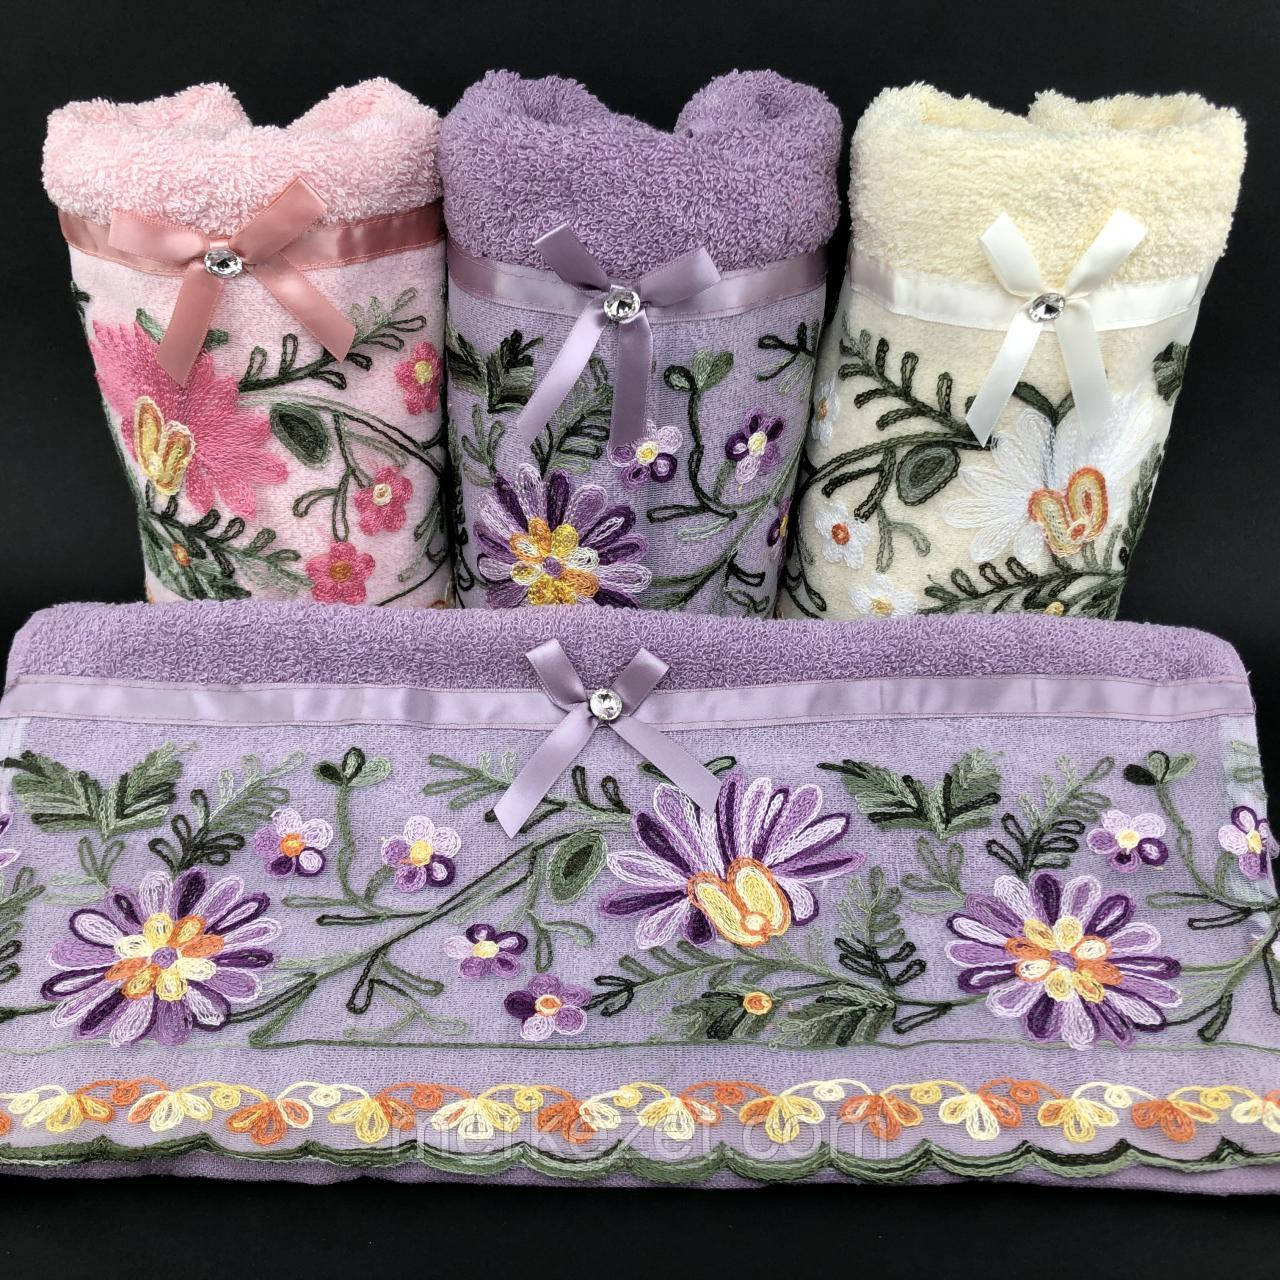 "Полотенце махровое для бани. Банное полотенце ""Равалли"". Банные полотенца махровые"